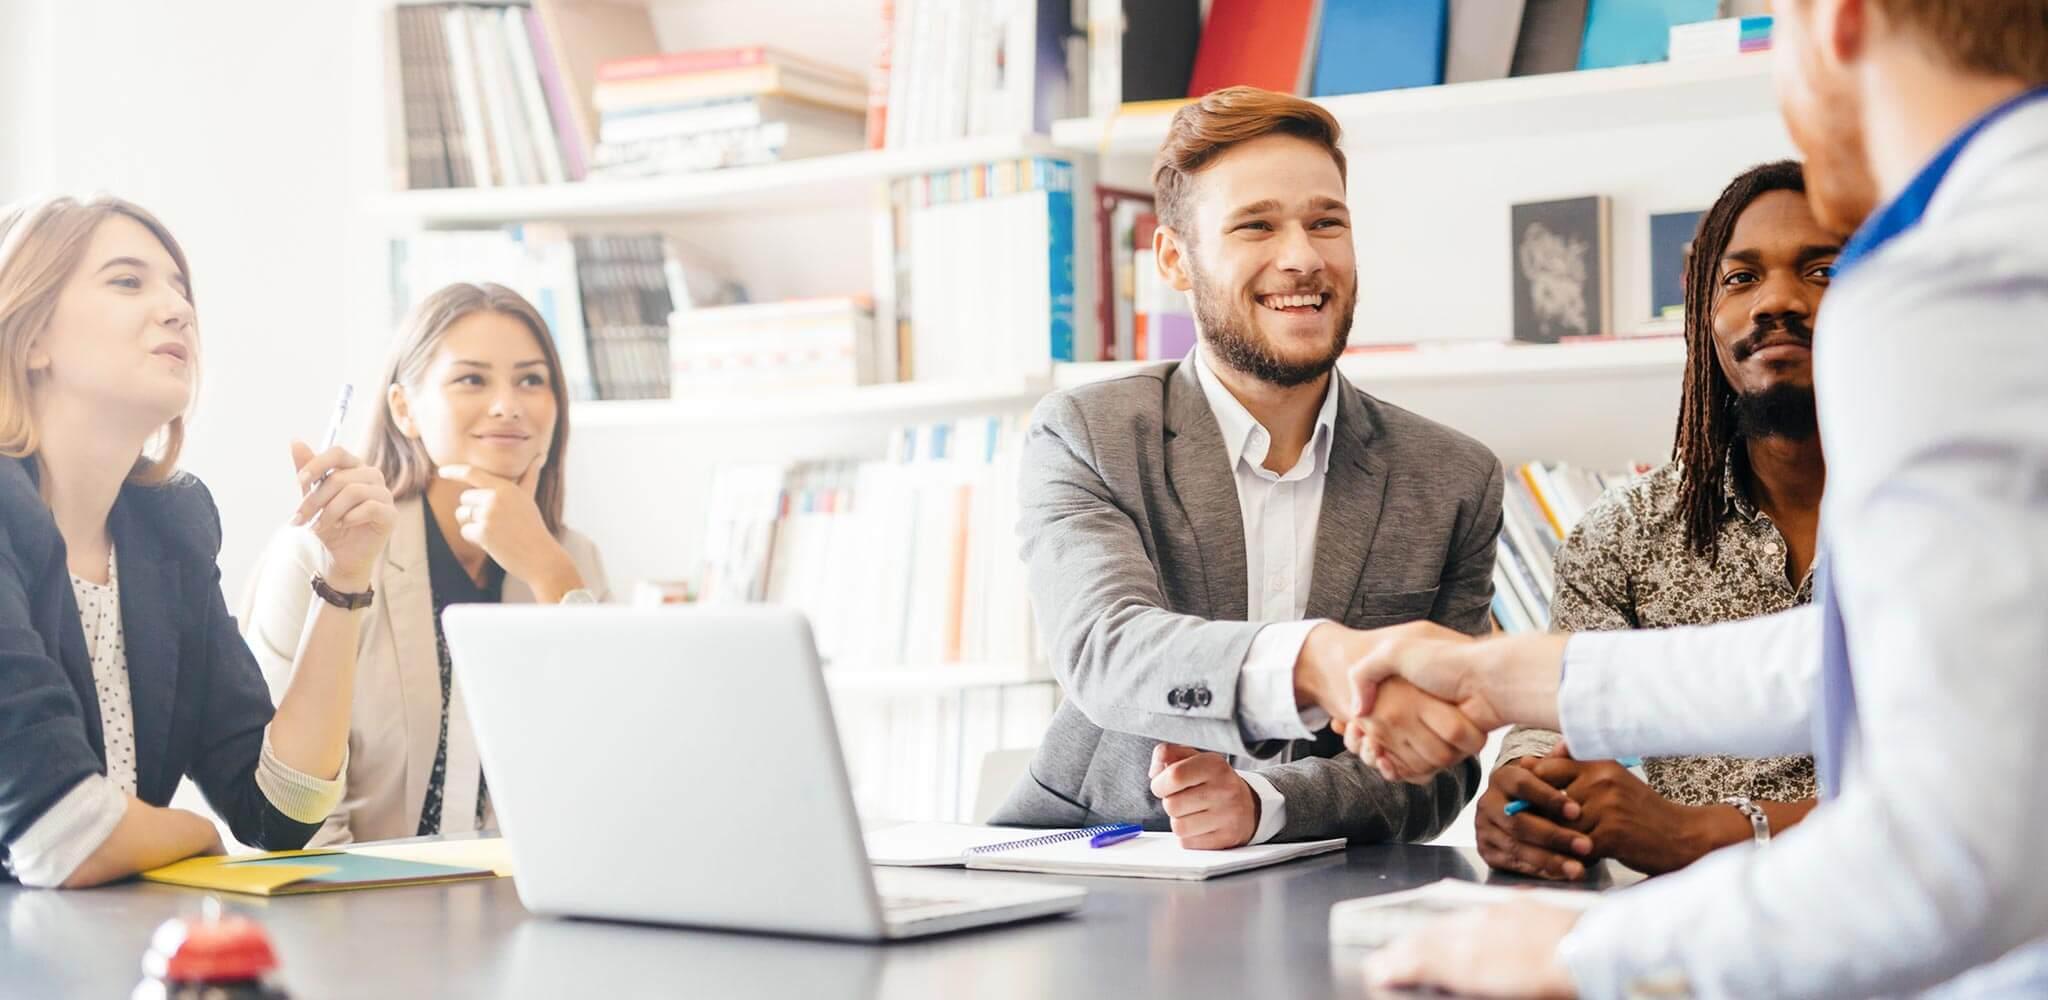 Expertise - Customer Relationship Management (CRM) Software